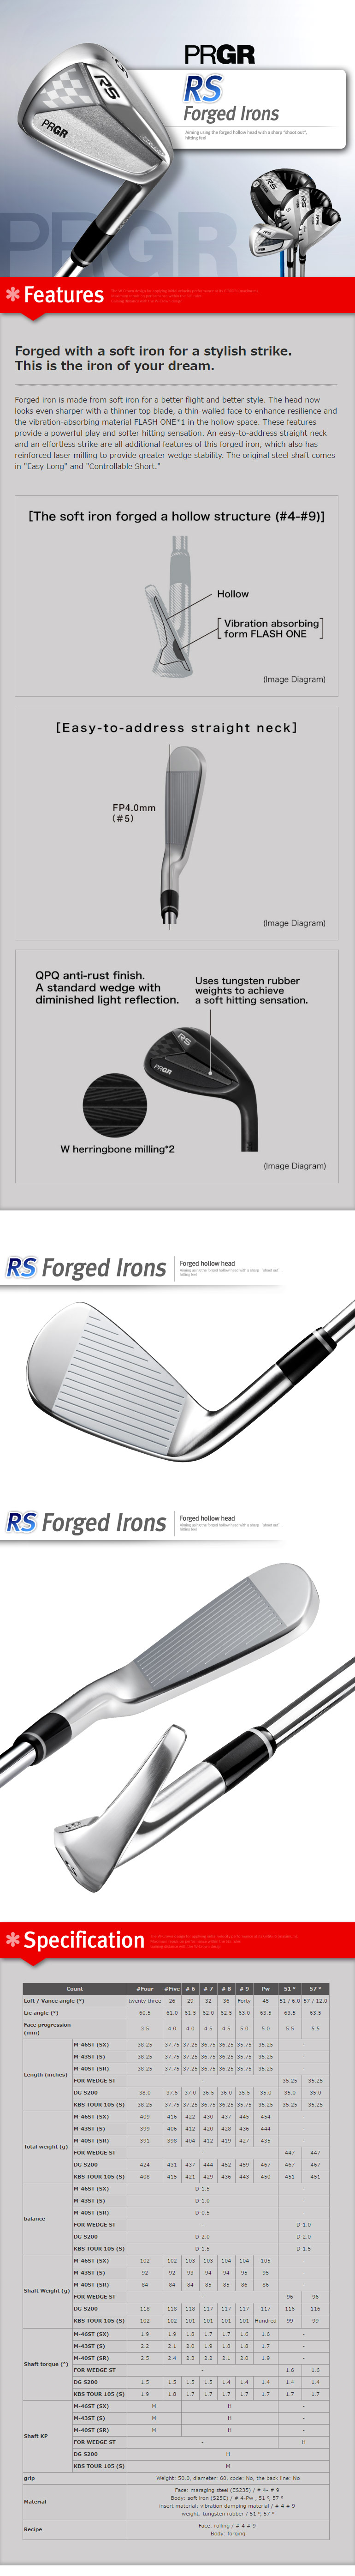 RS_Forged_I_desc.jpg